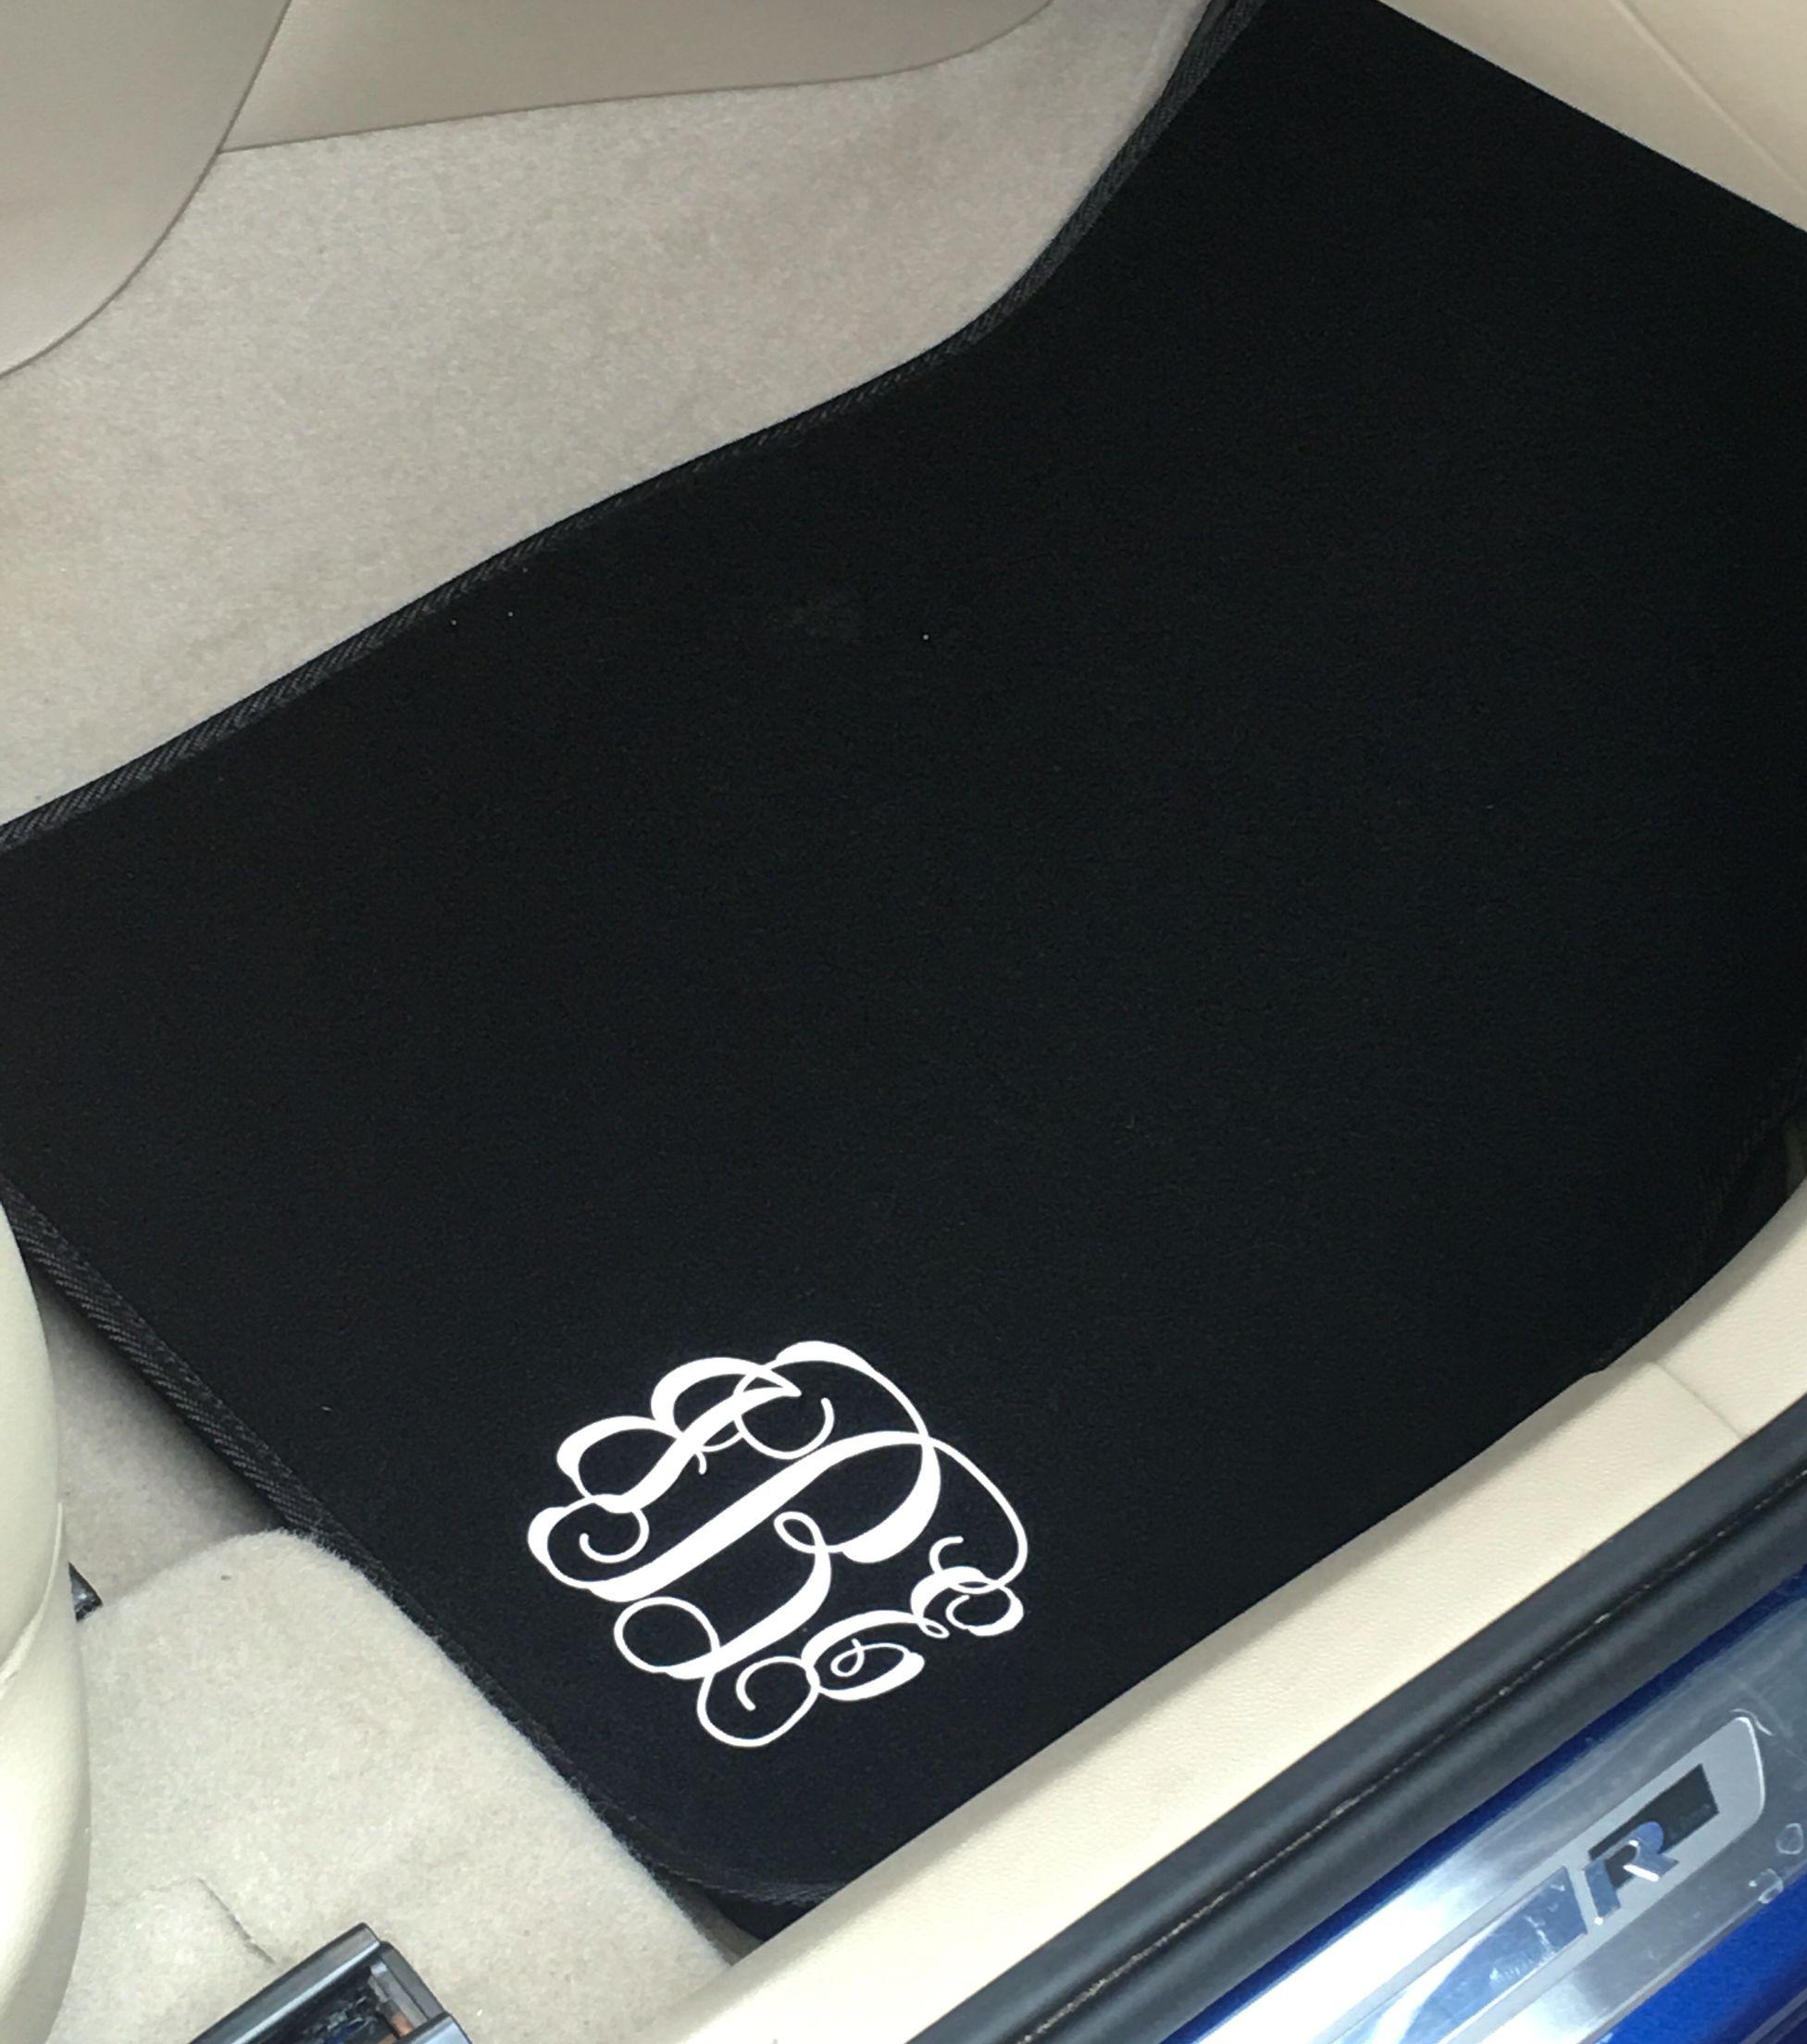 bhp accessories other team honda mats forum car premium modifications kagu page